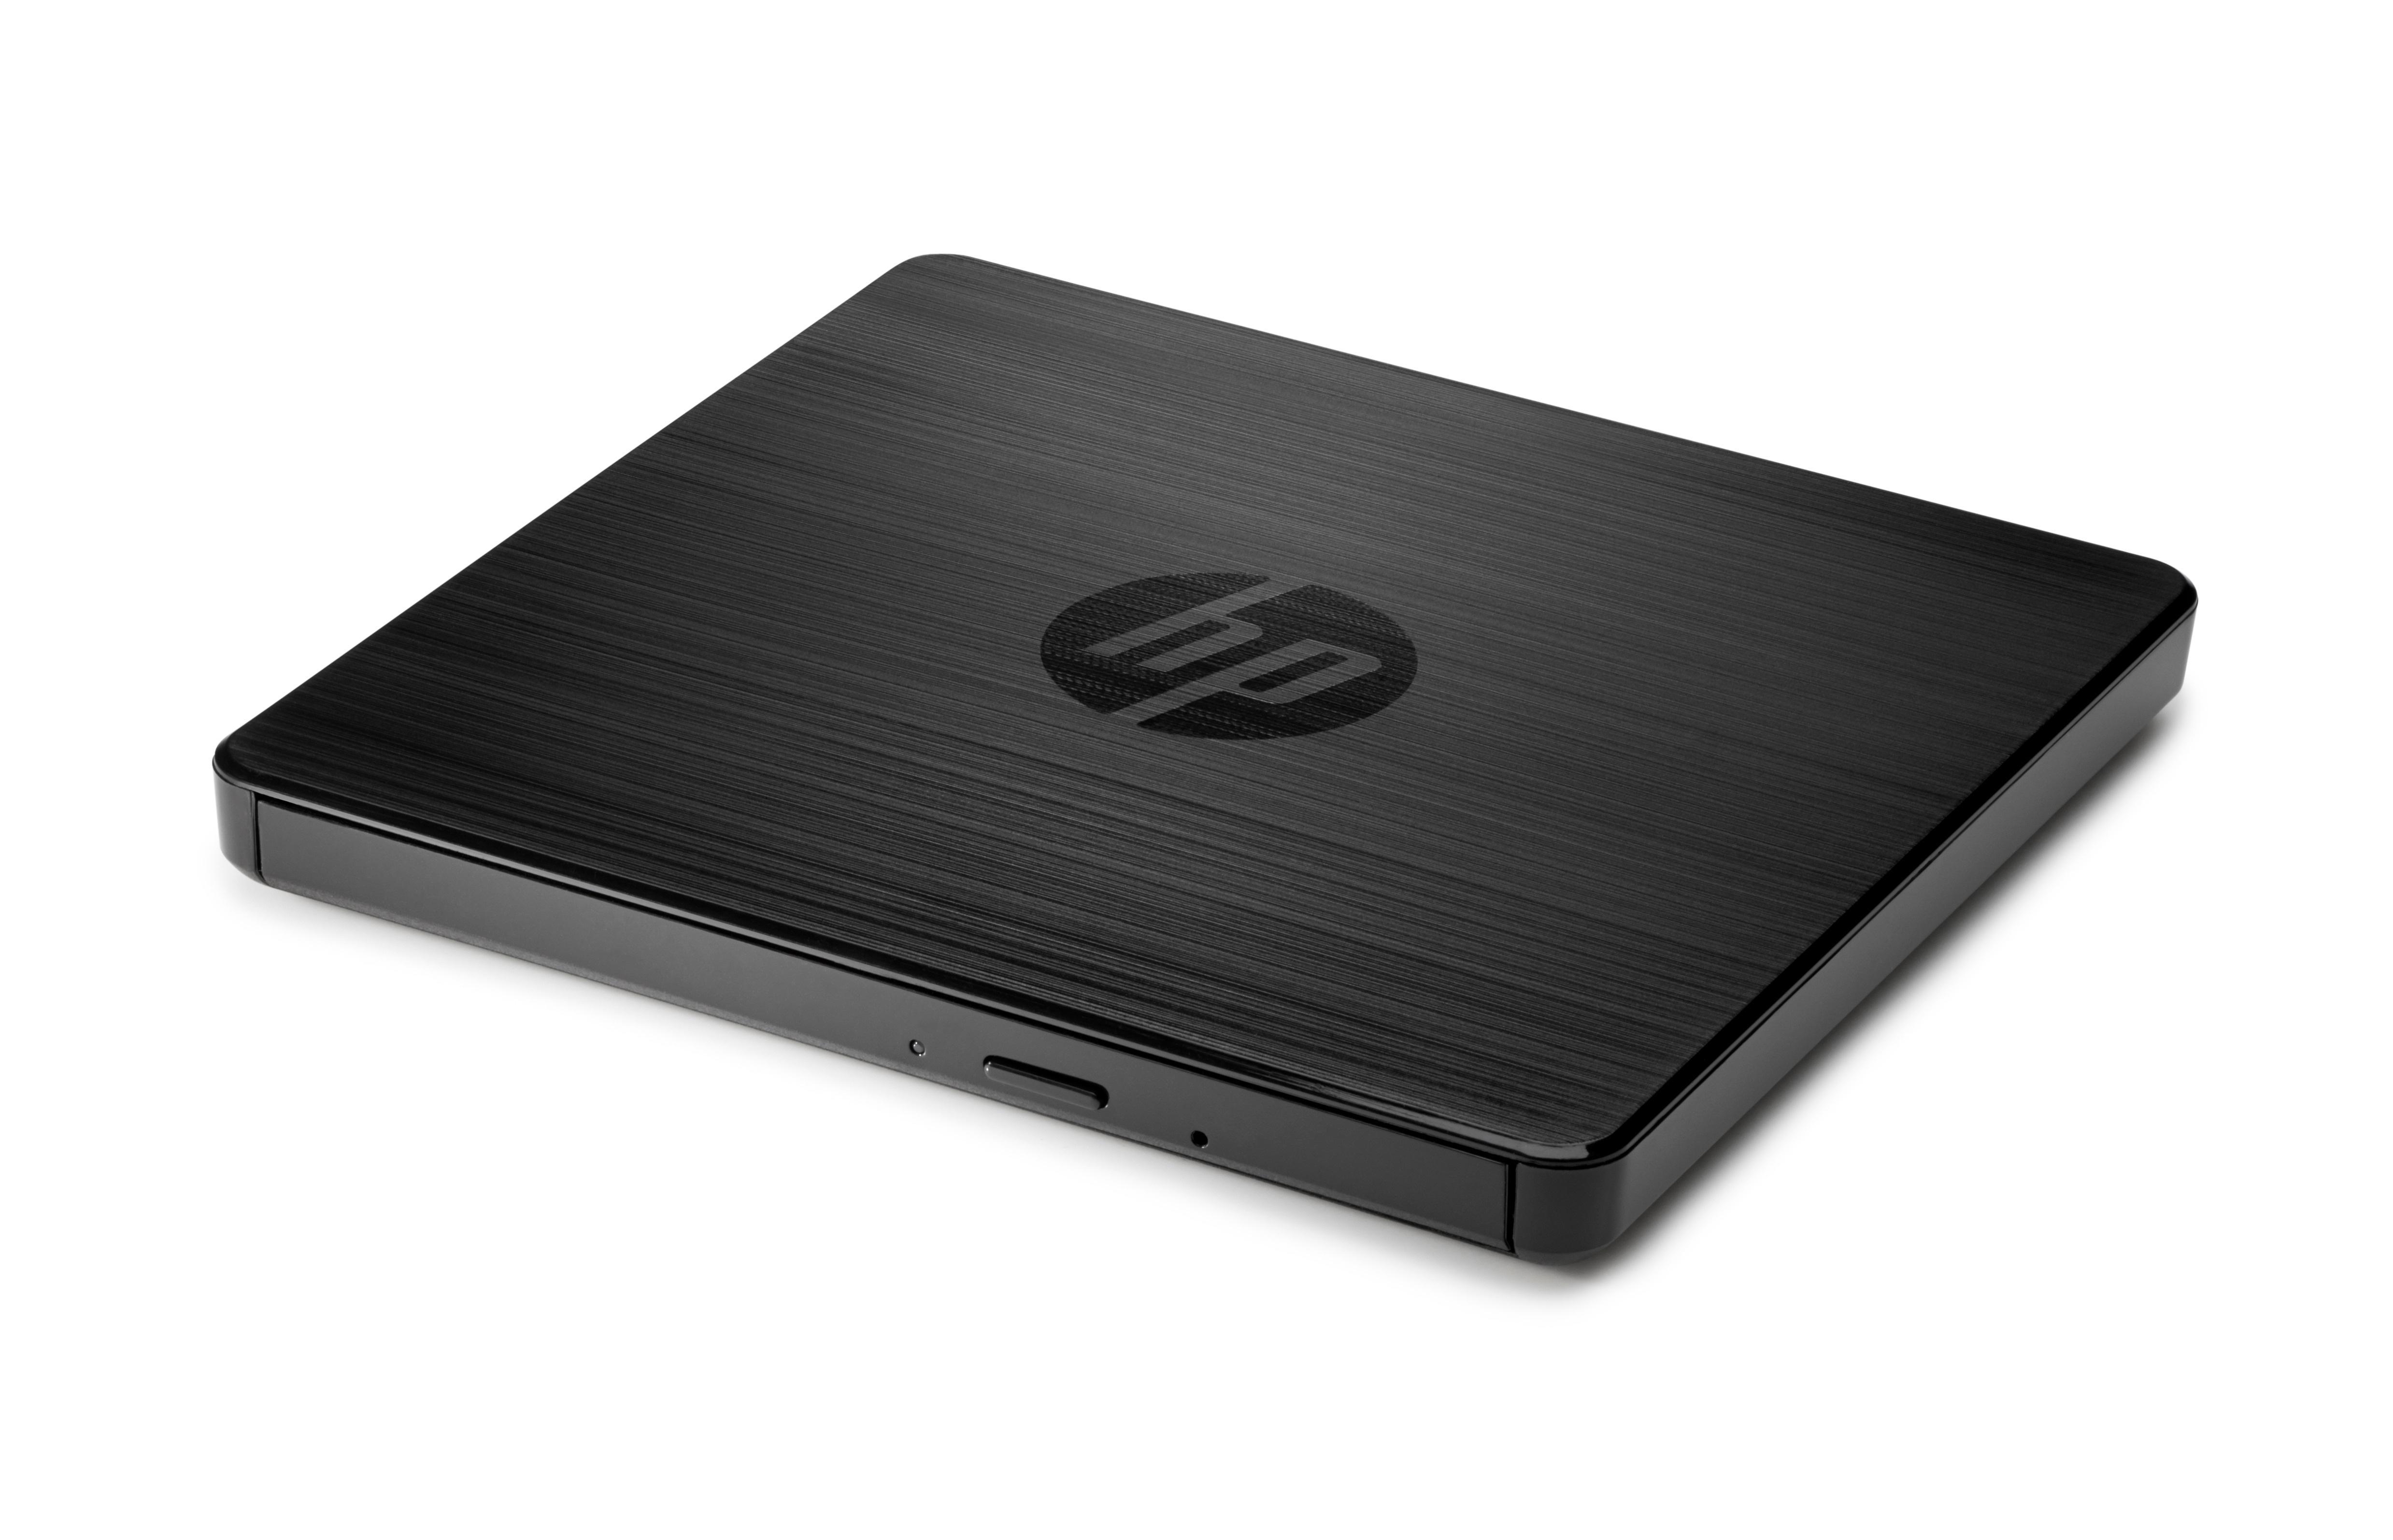 HP Unità esterna DVDRW USB